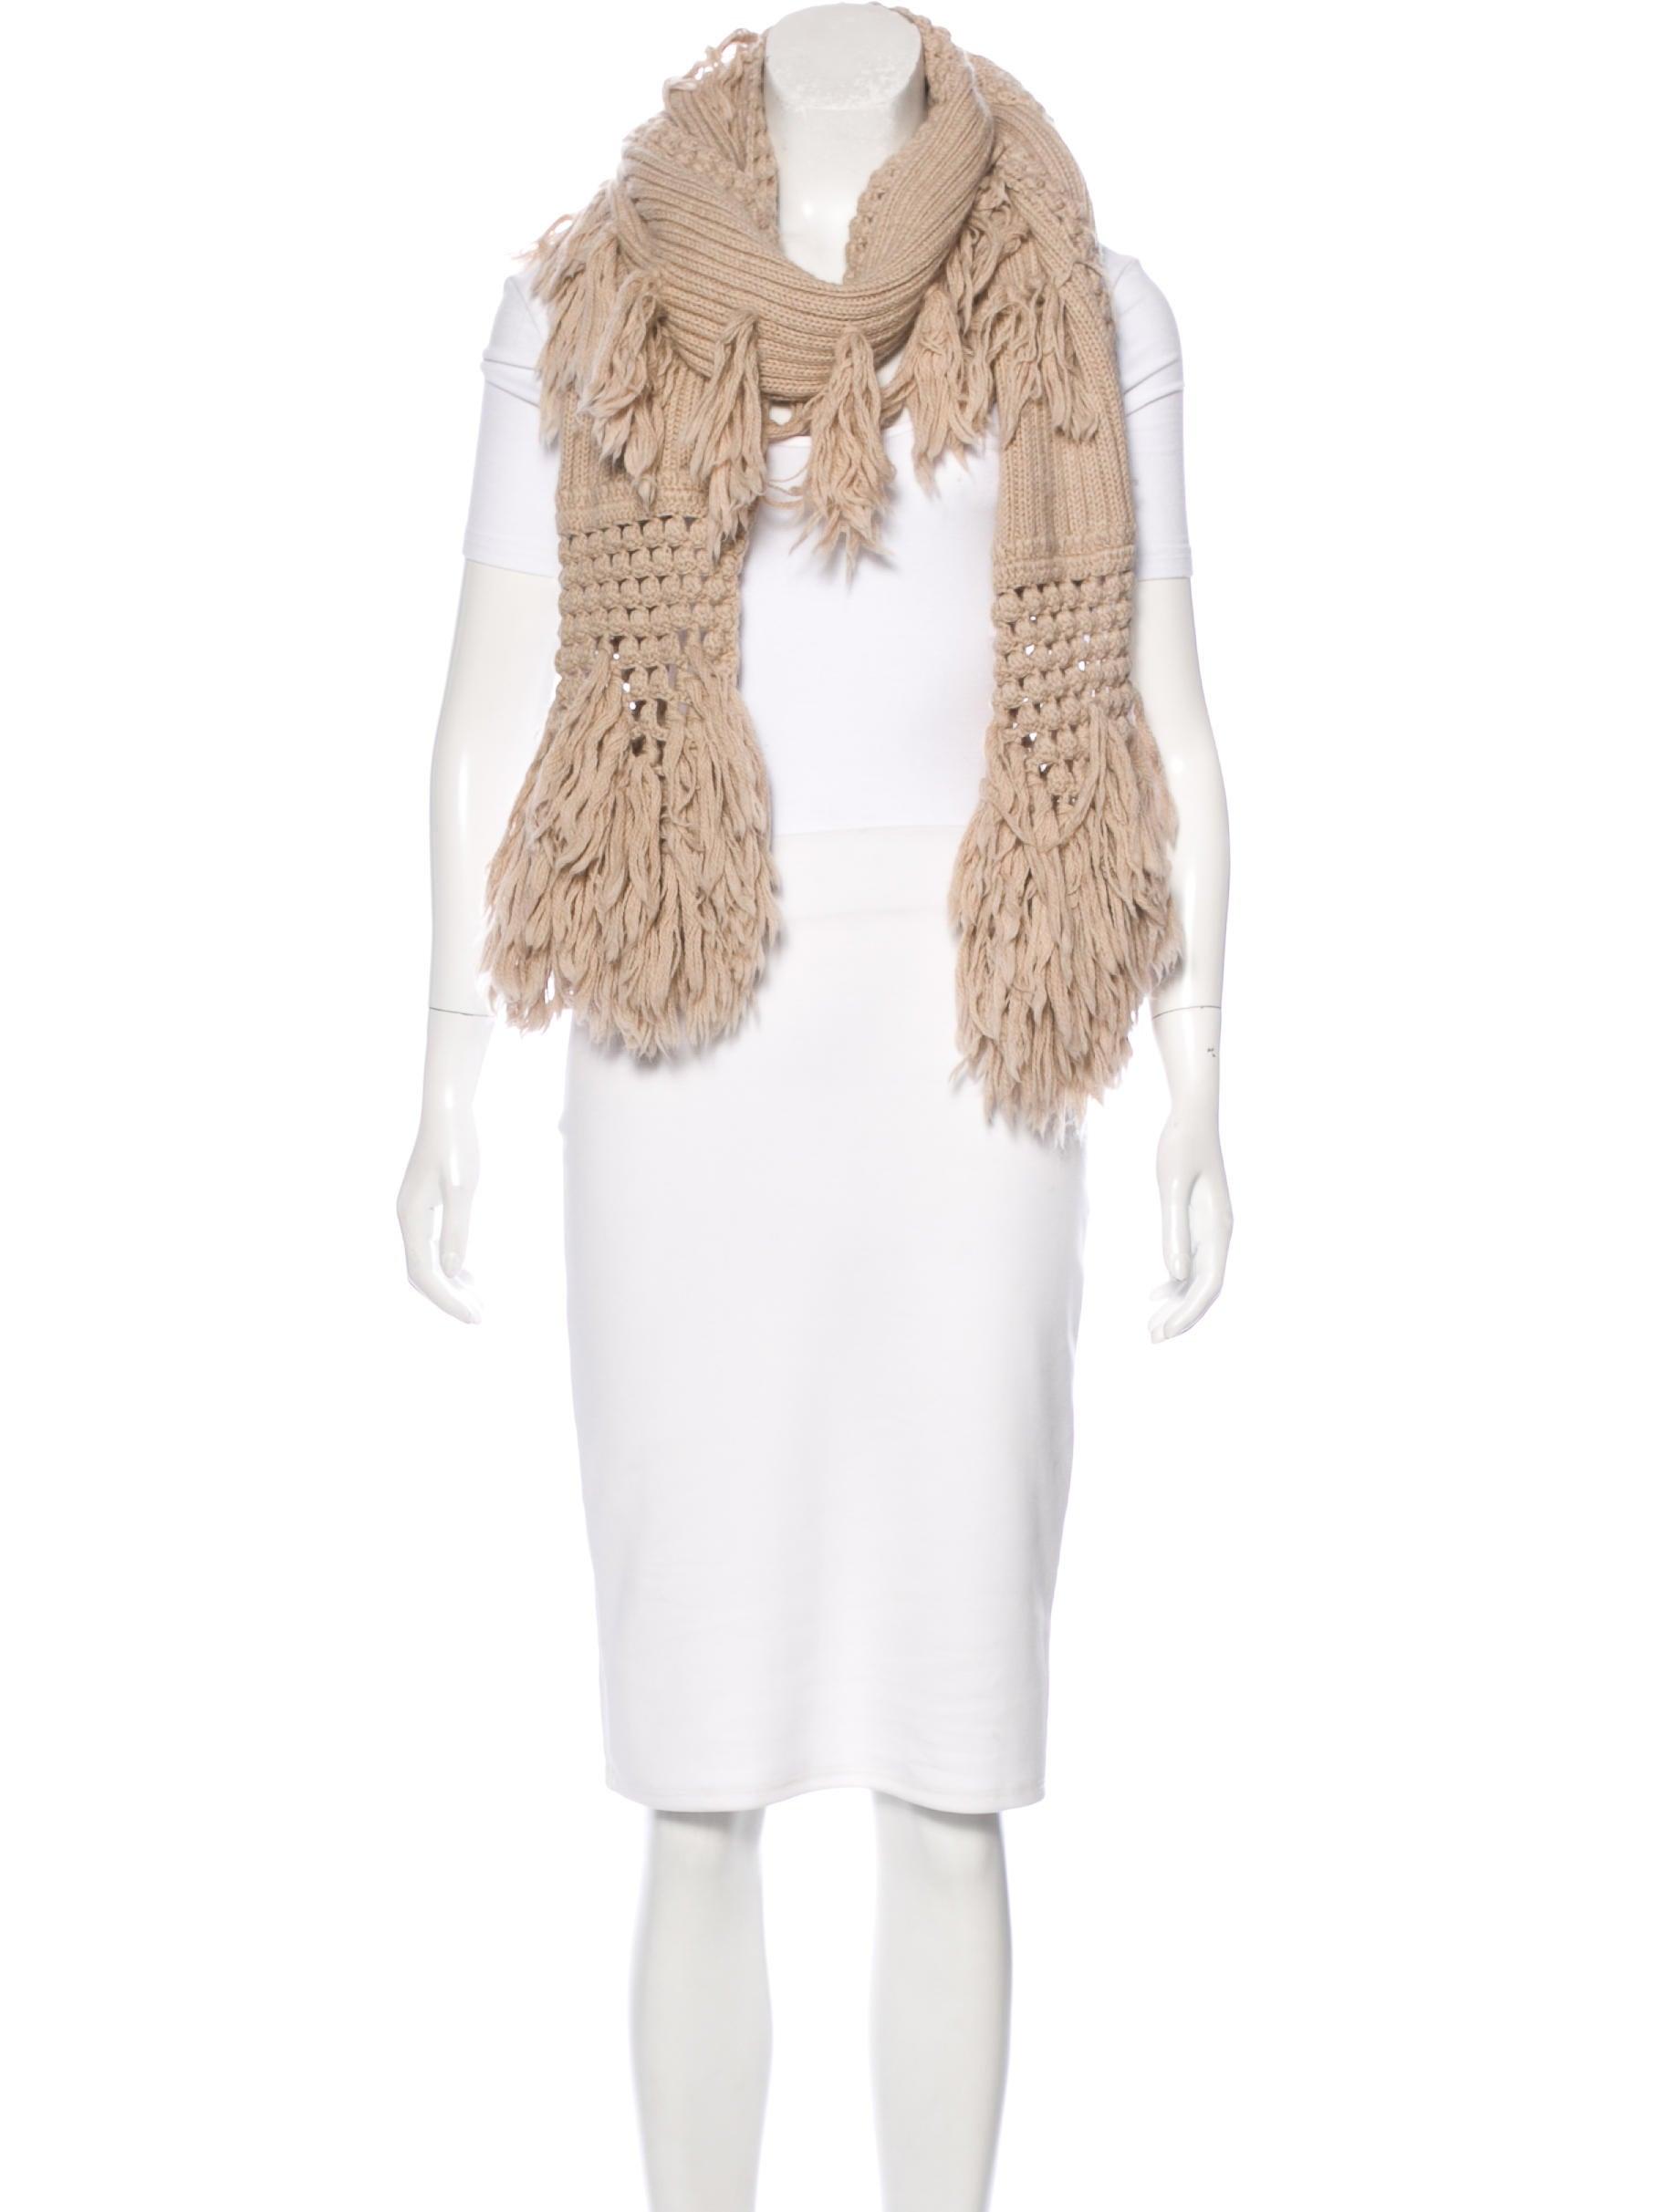 Knitting Websites Australia : Ugg australia rib knit wool blend scarf accessories